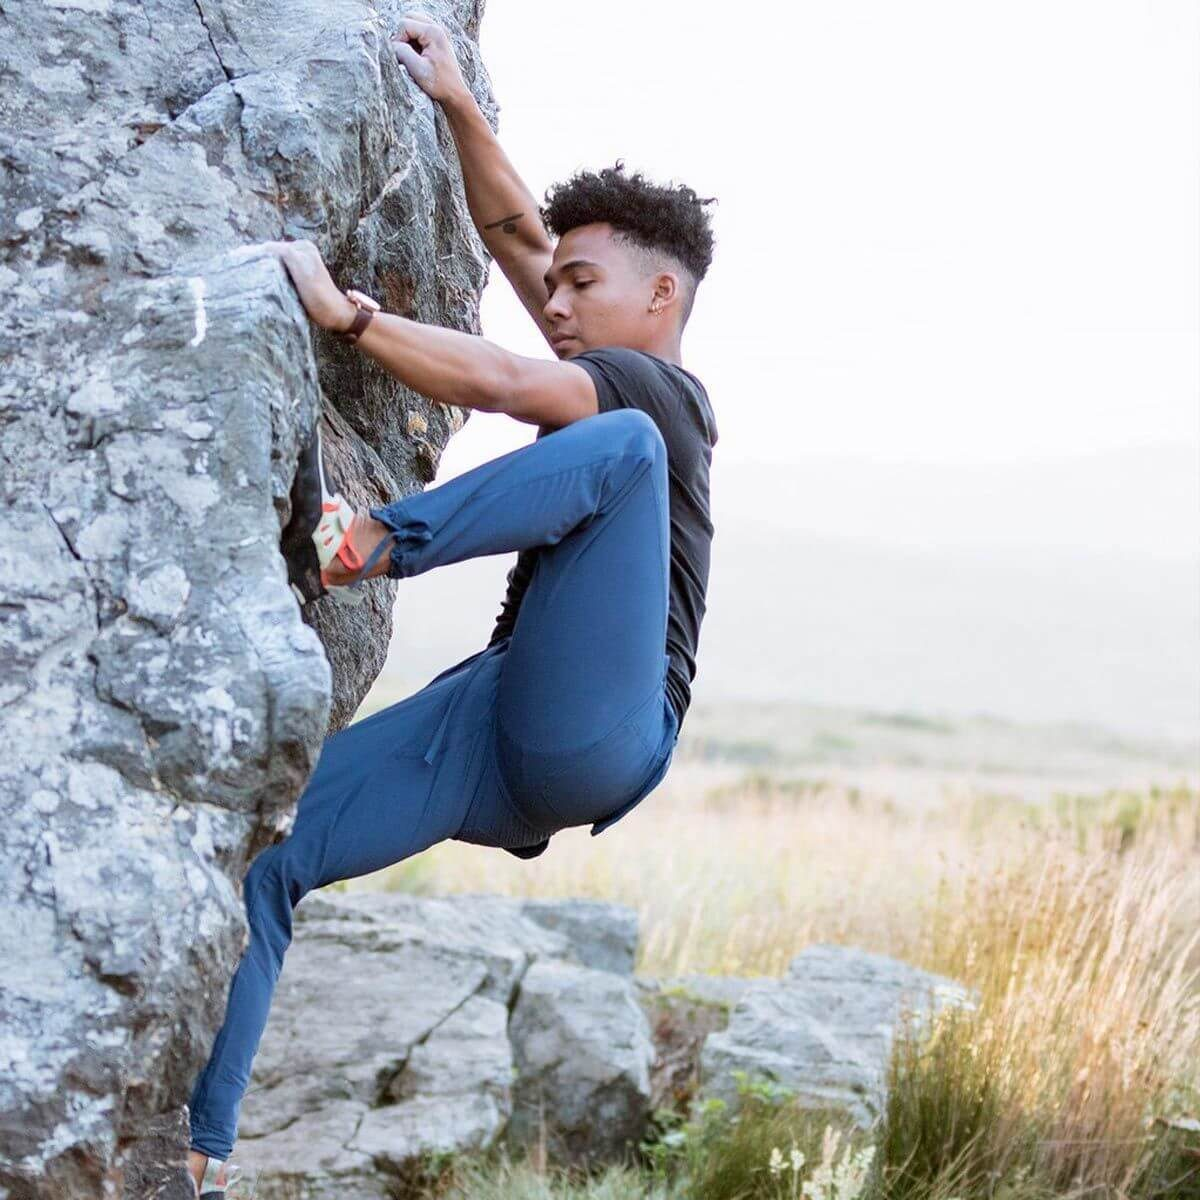 hiking pants rock climbing